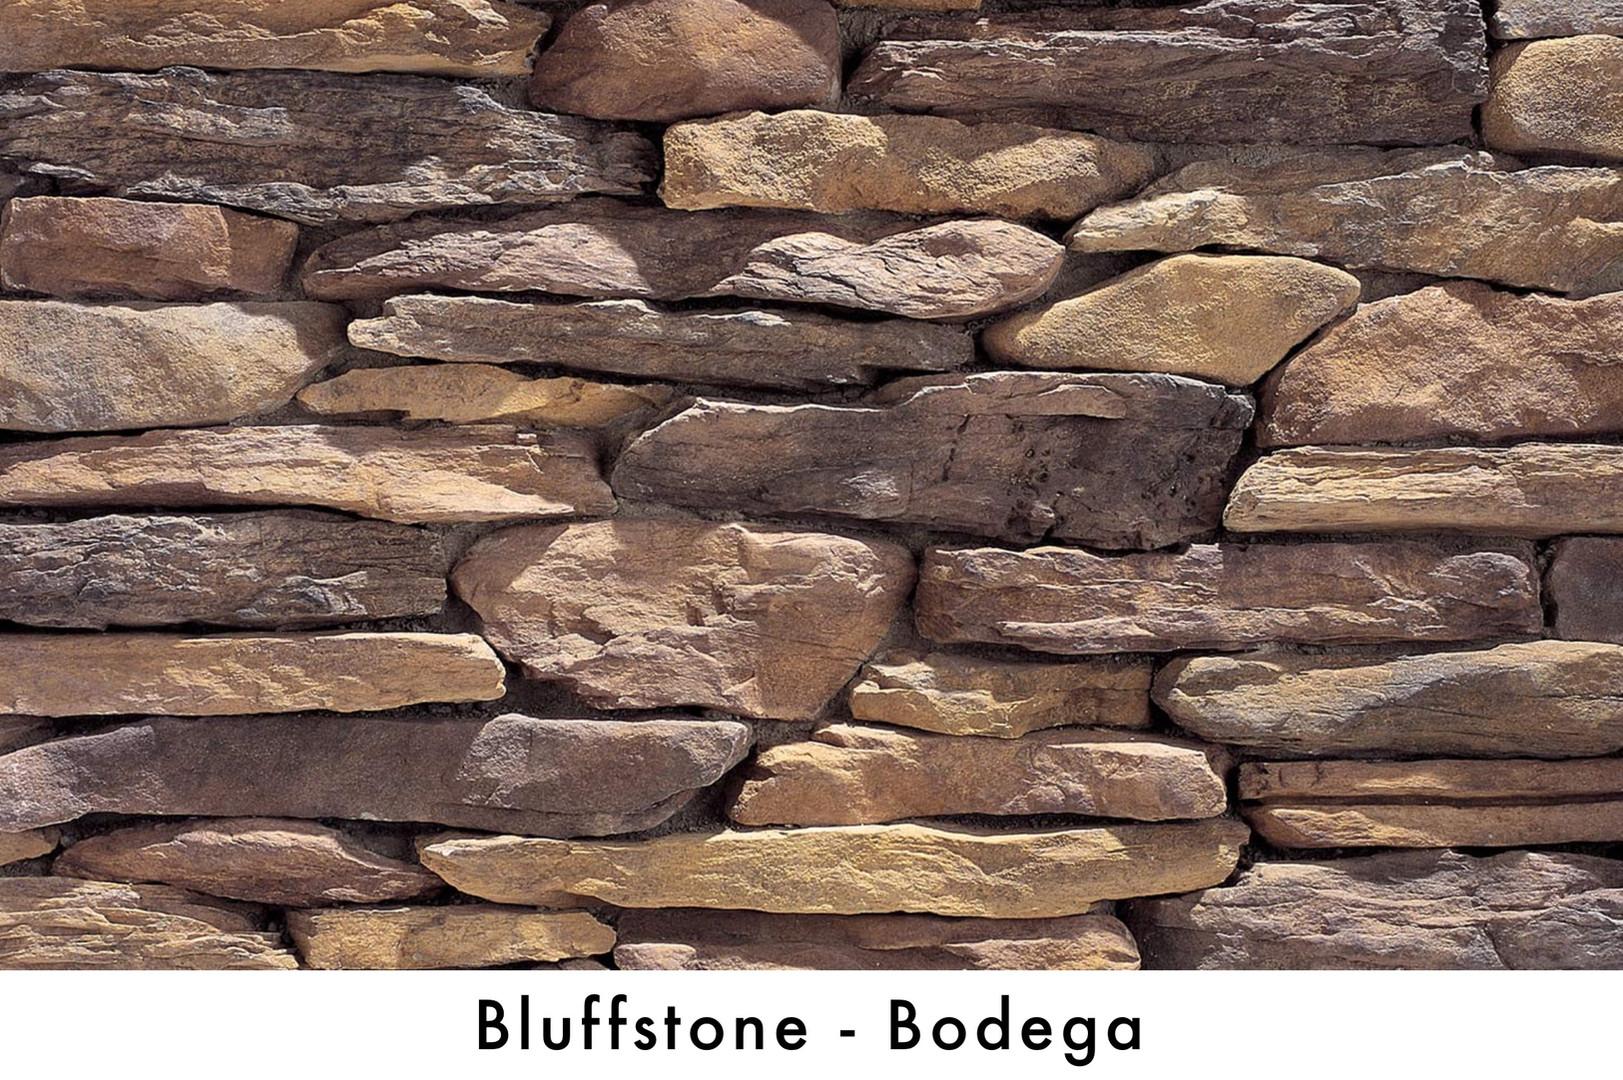 Bluffstone - Bodega